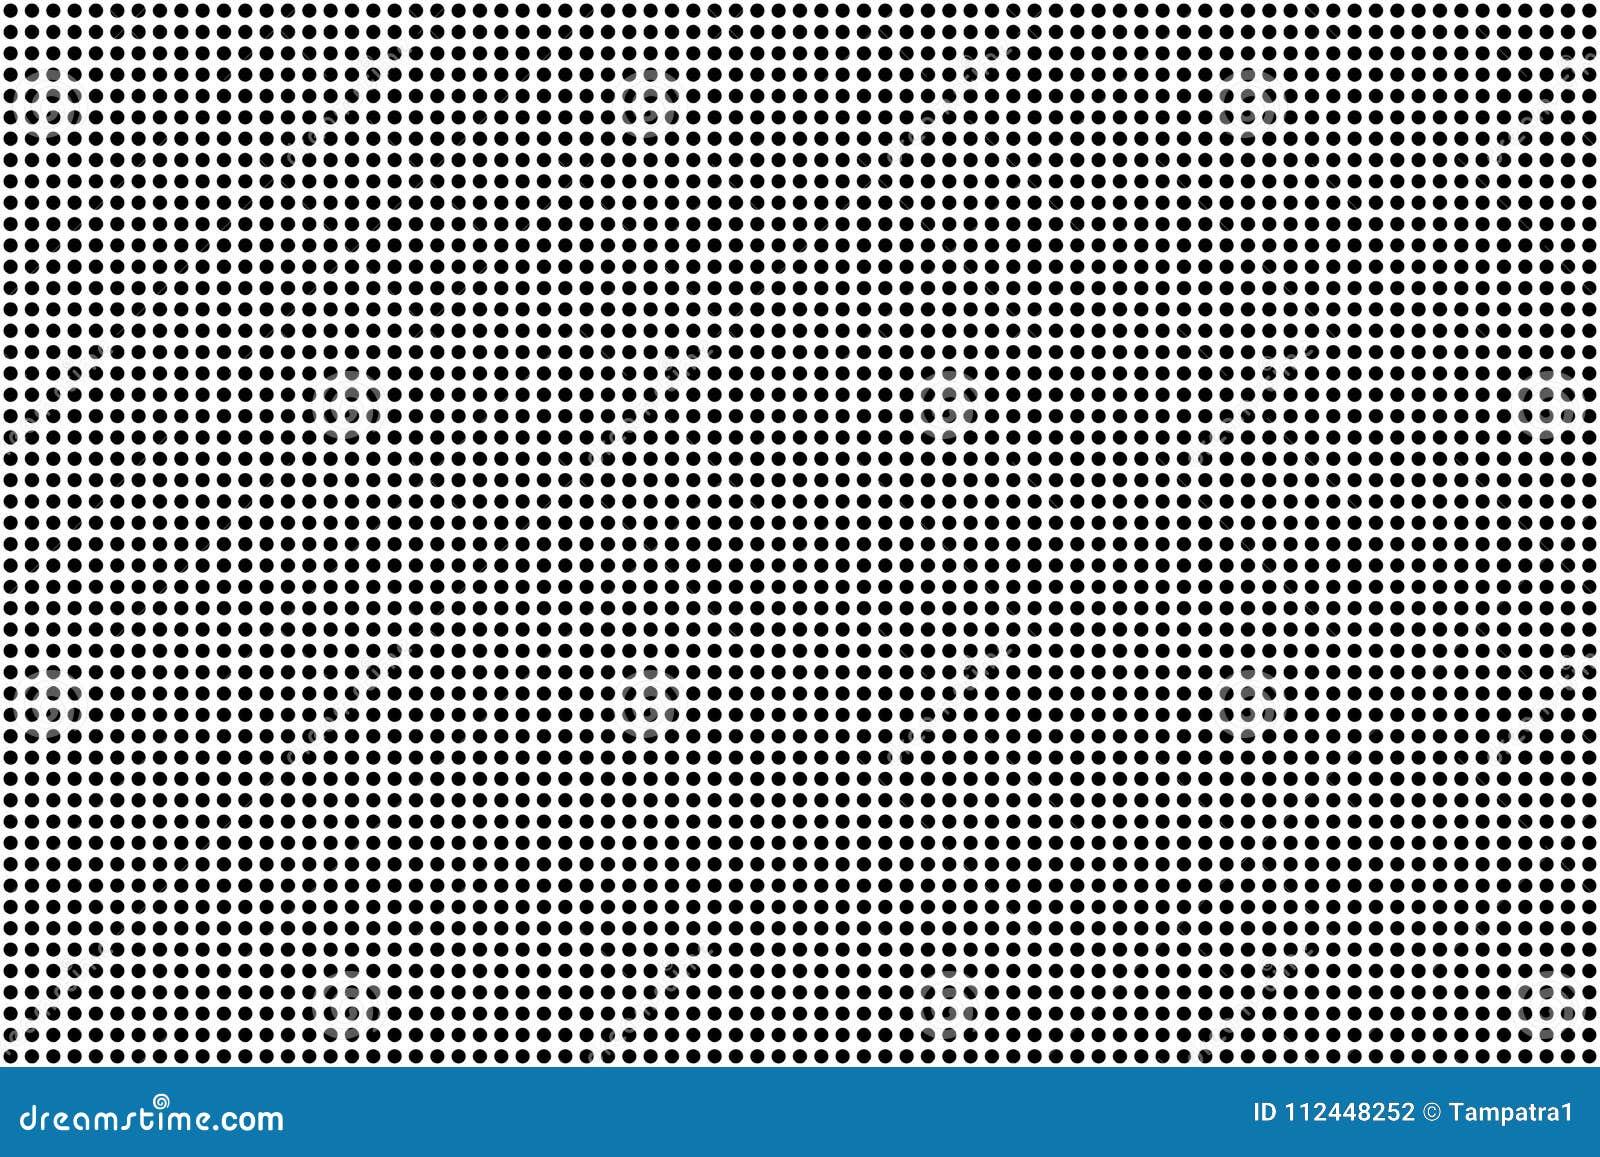 Polka dot pattern seamless, pattern on white background.